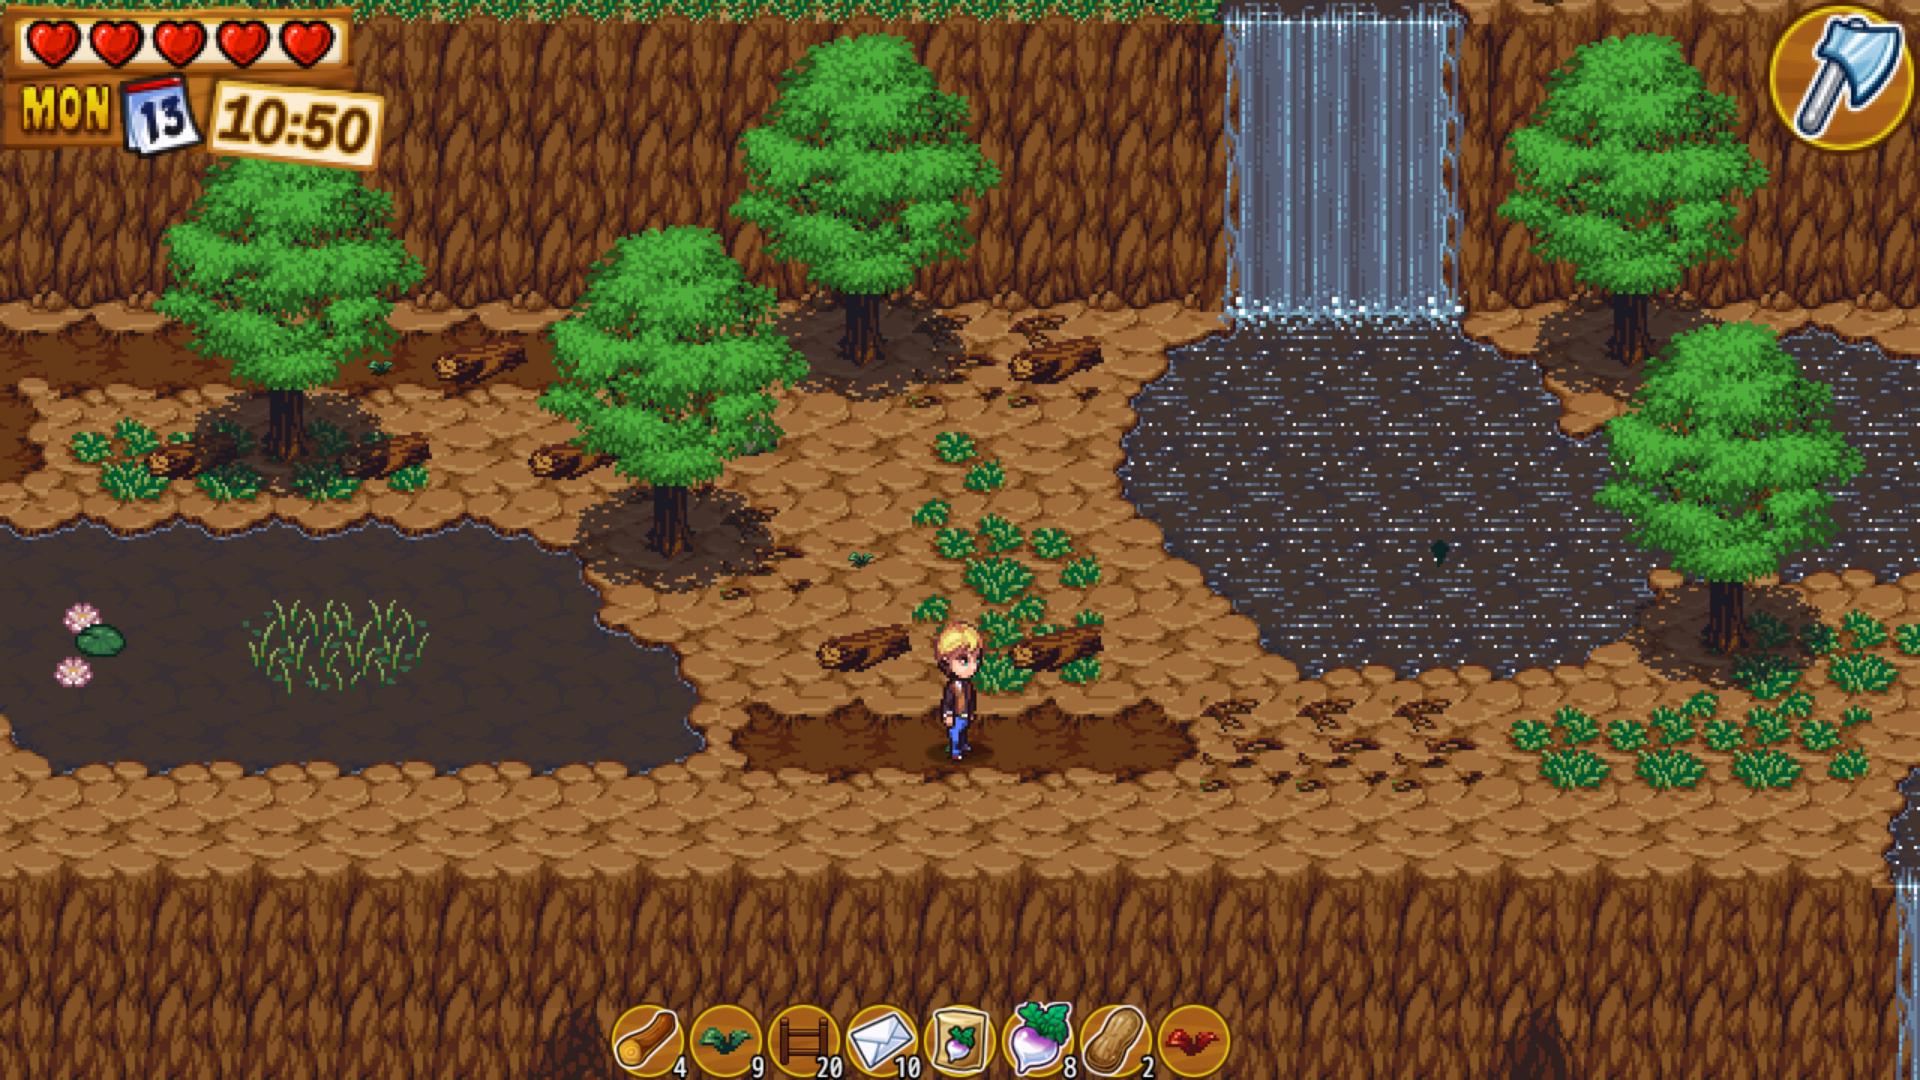 Summer image - Fantasy Farming: Orange Season - Mod DB